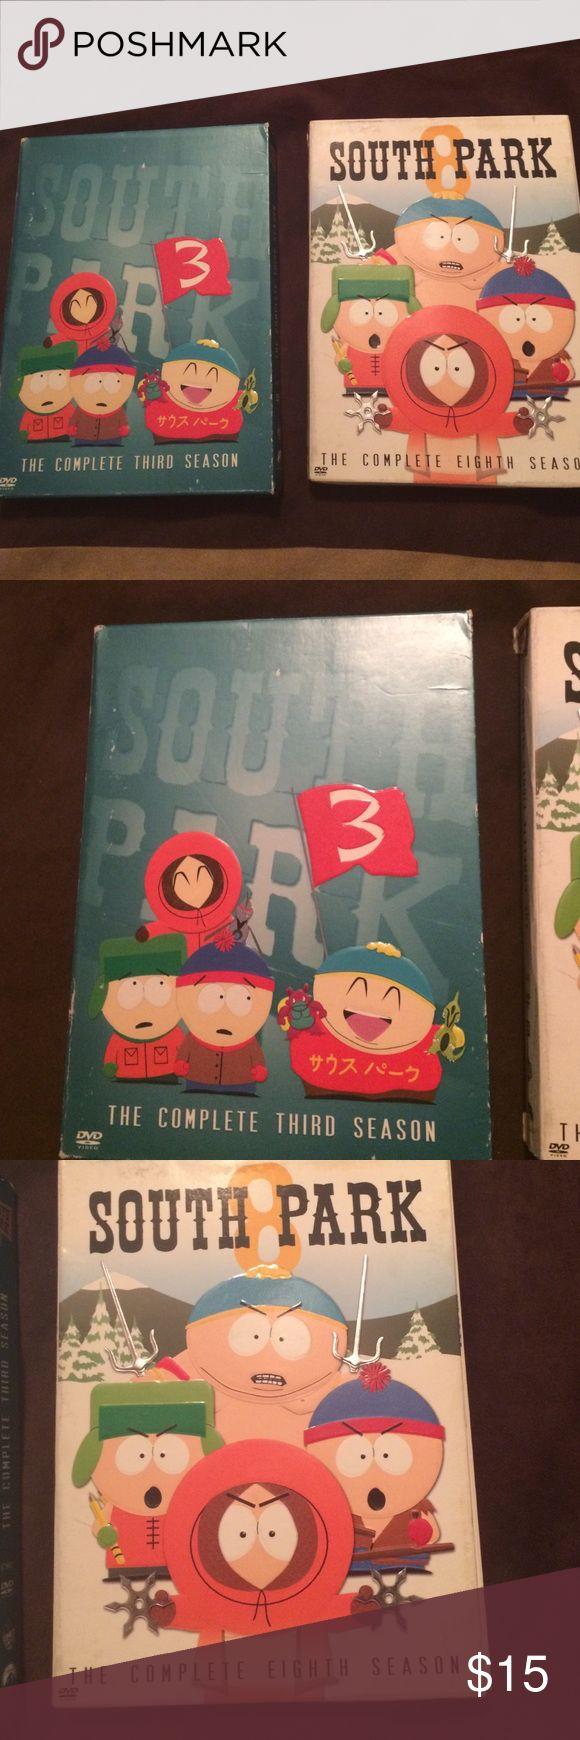 South Park DVD South Park season 3 and season 8 DVD sets Accessories